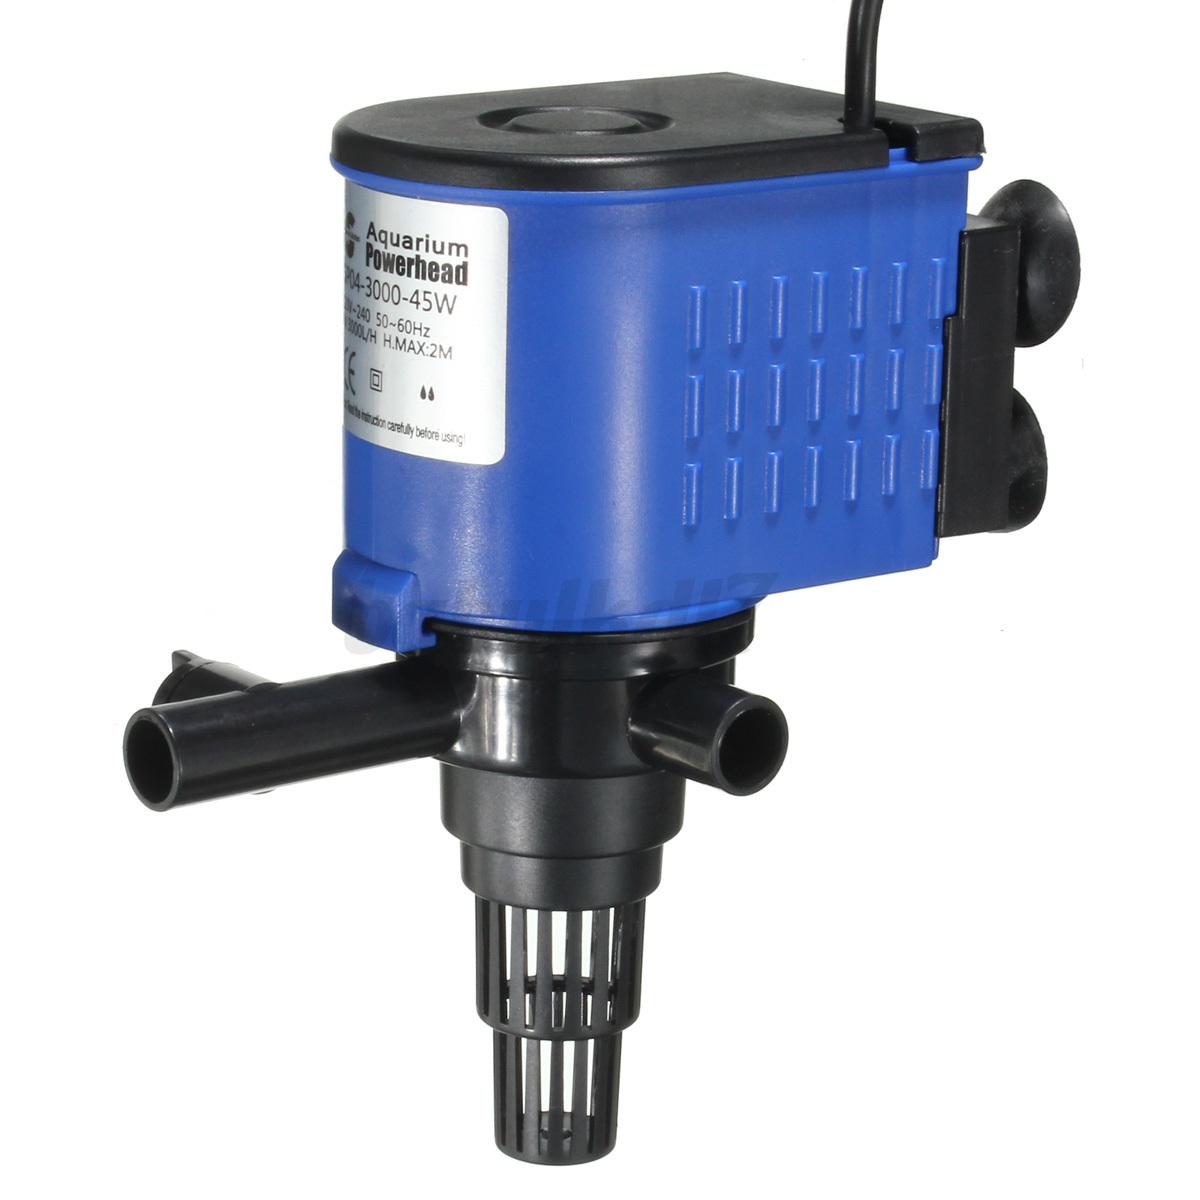 3 in 1 aquarium fish tank powerhead wave purifier filter for Fish tank oxygen pump